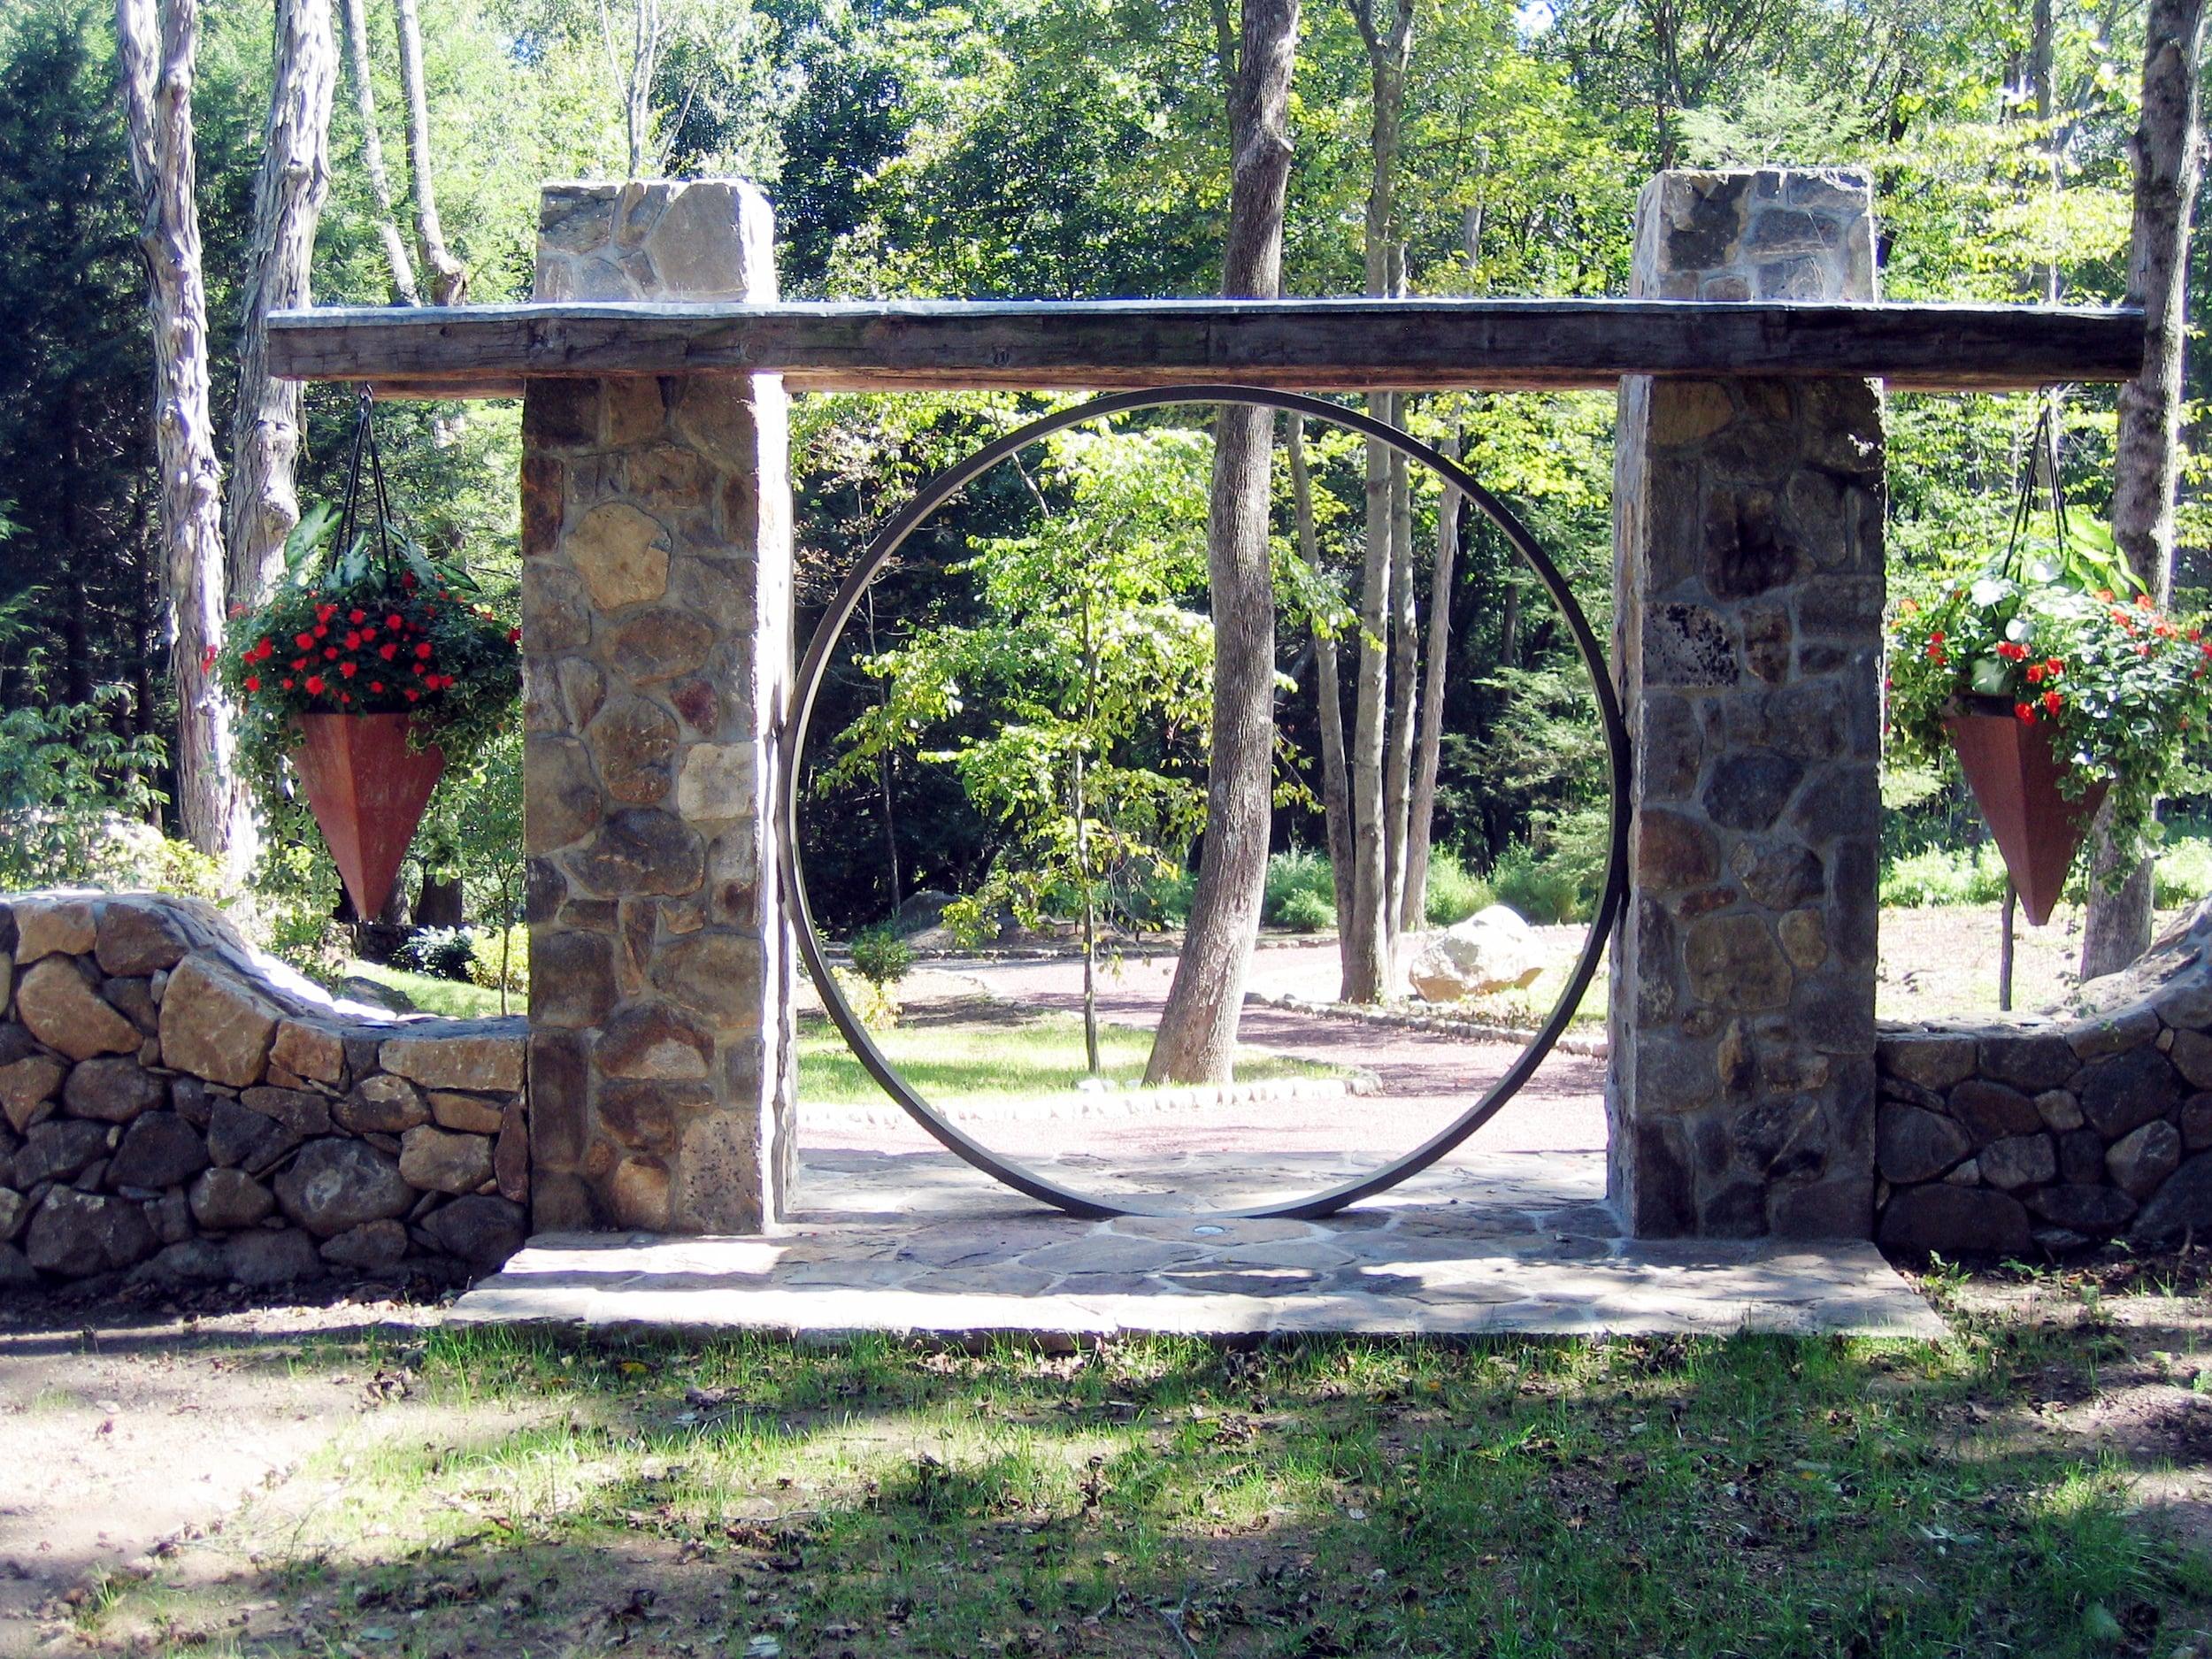 Redding.Connecticut.Moracco.Robert_Orr_&_Associates.Architecture.Landscape_Architecture.Urbanism.Gate.jpg